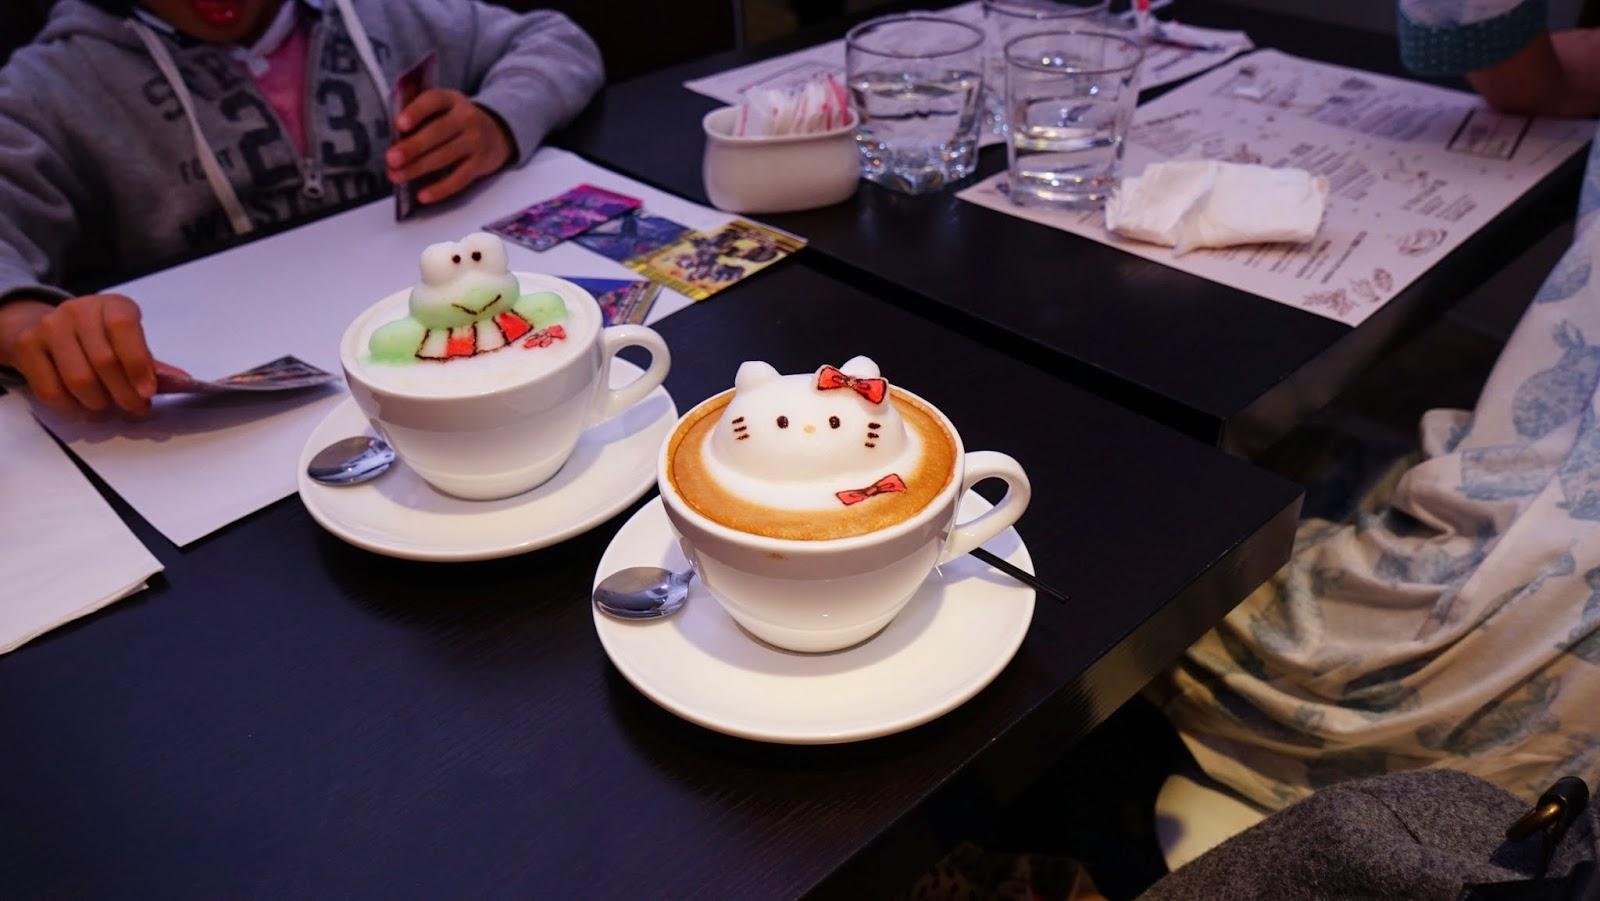 香港 新蒲崗 Mikiki Karena Cafe 3D拉花 咖啡 晚餐 Cappuccino Hello Kitty